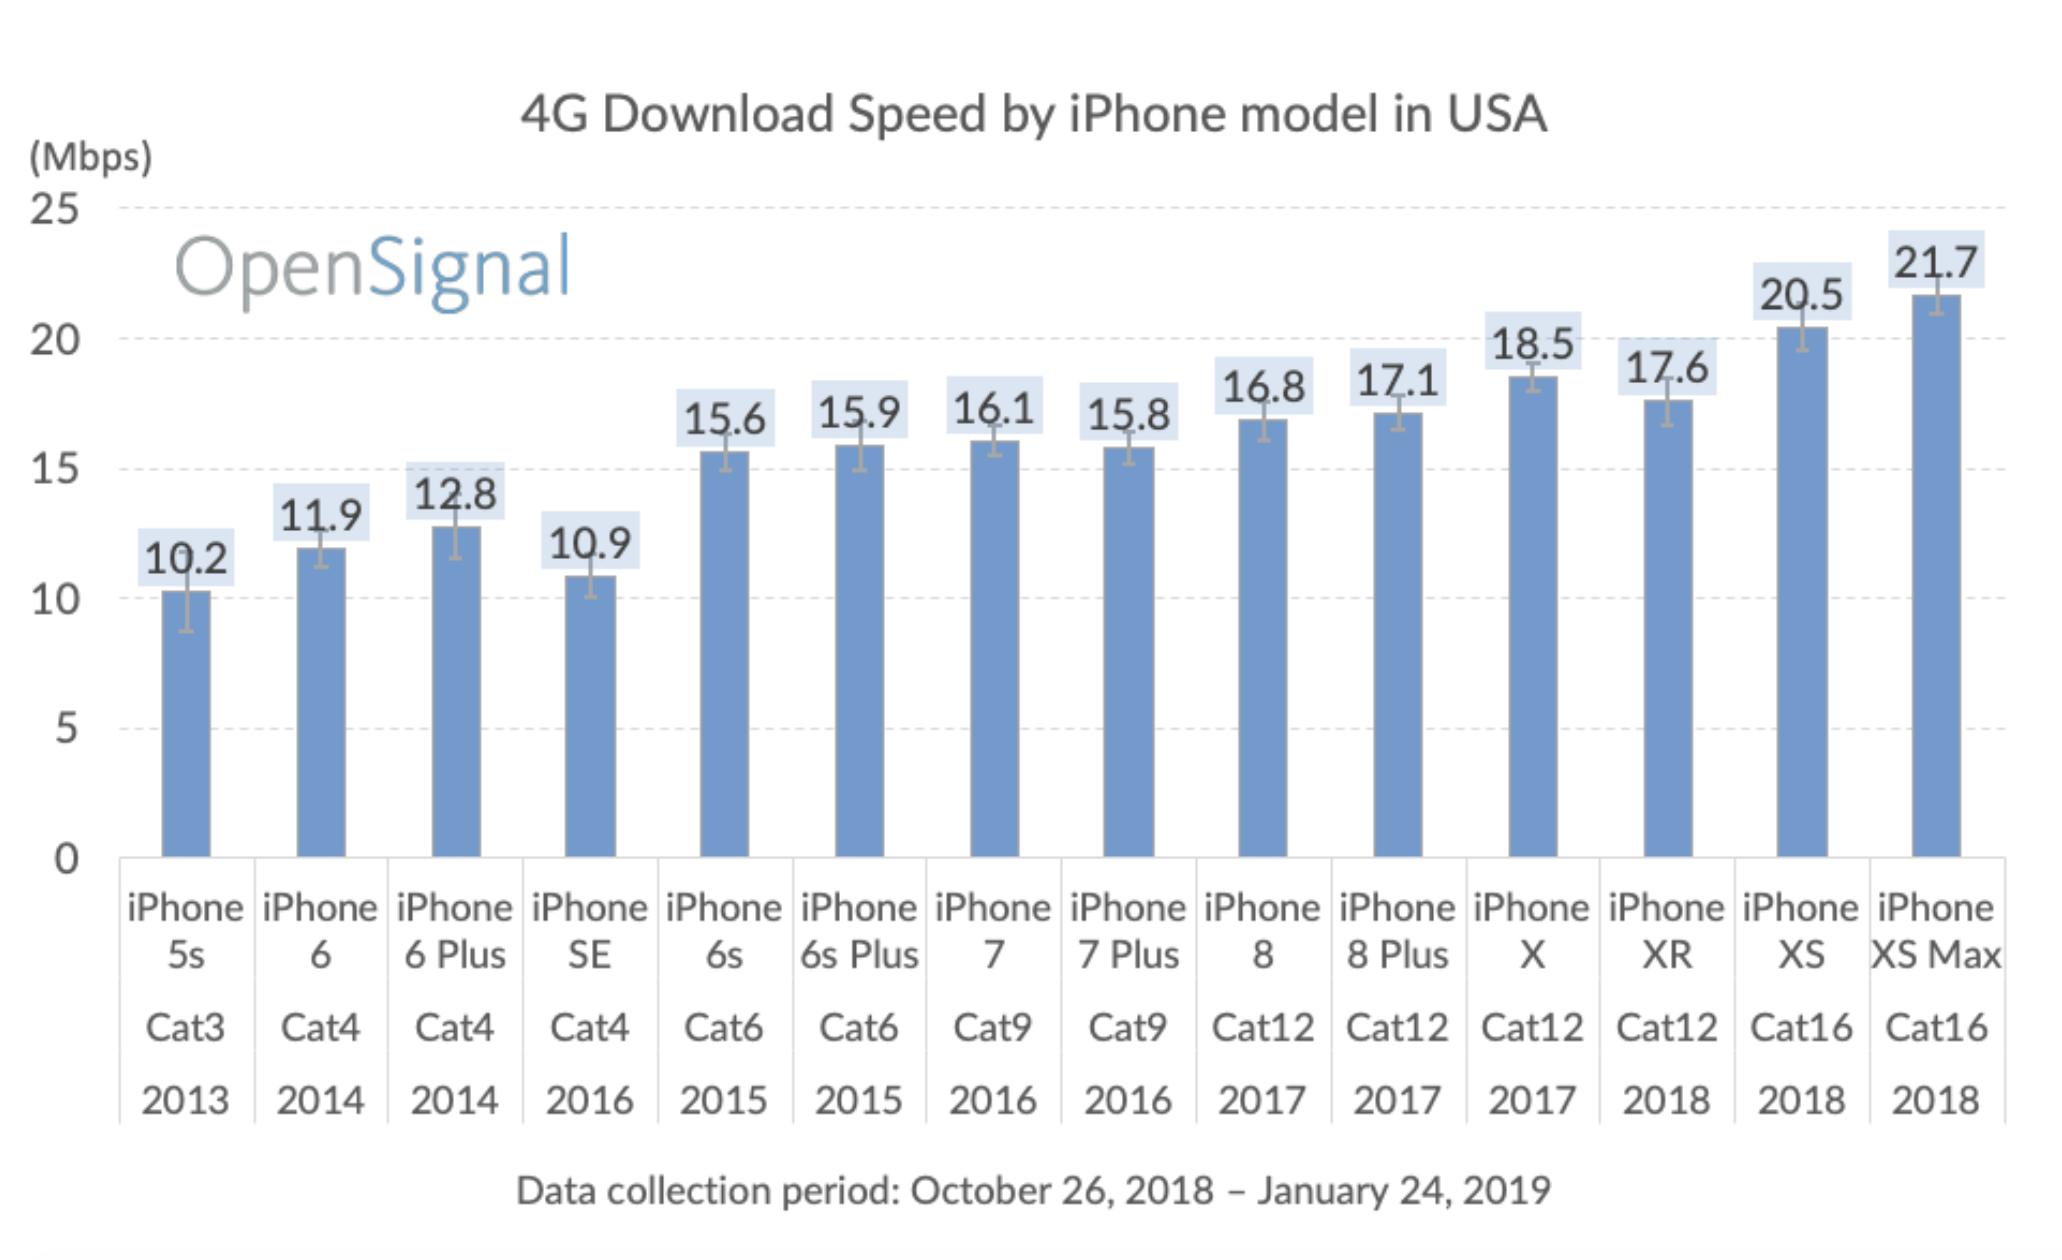 Velocidade de download 4G/LTE nos iPhones